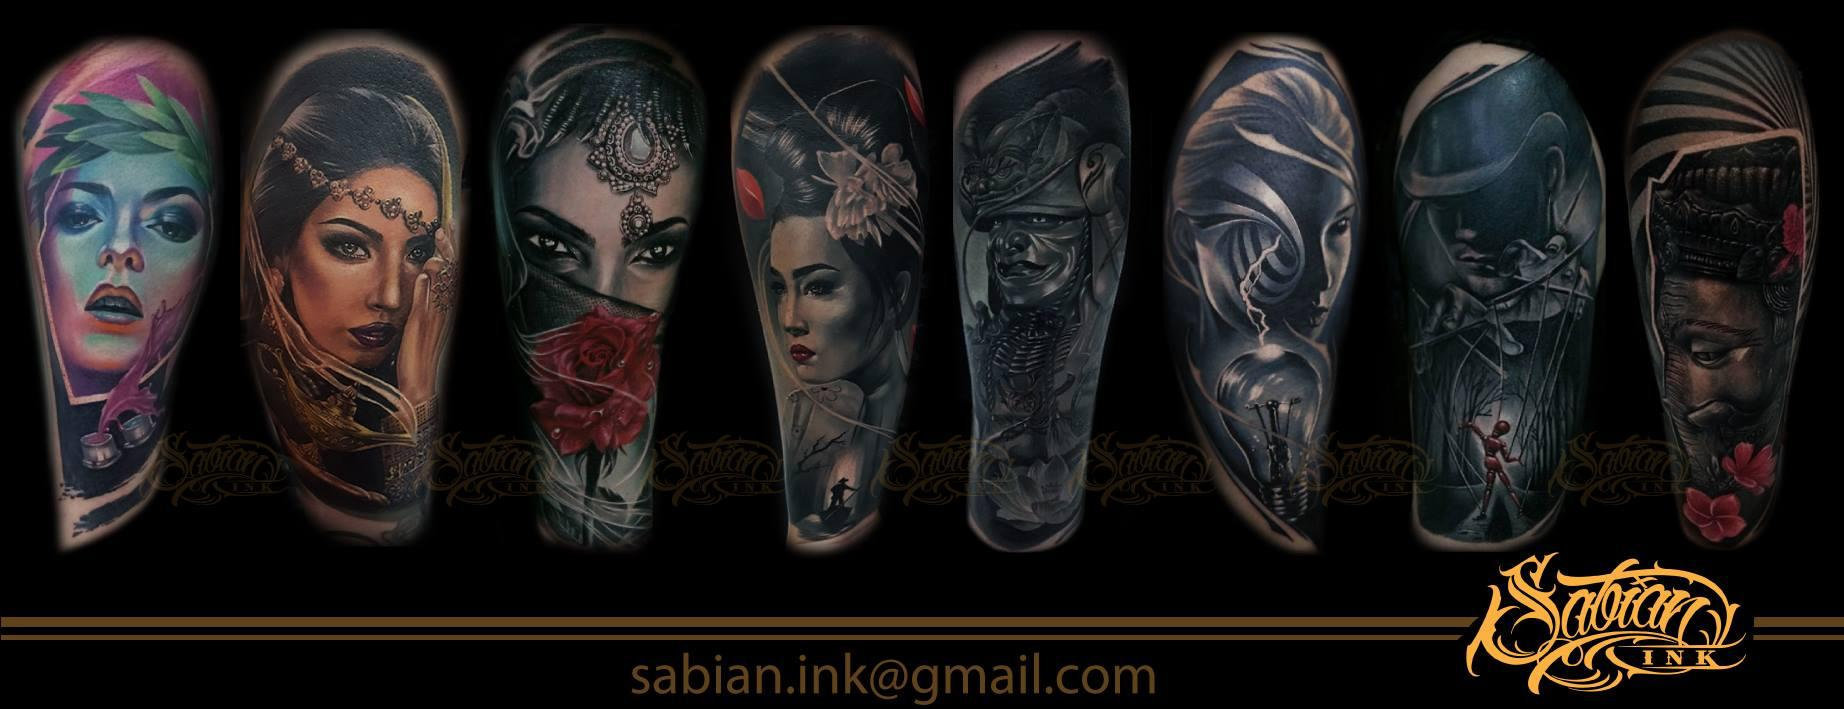 Sabian ink